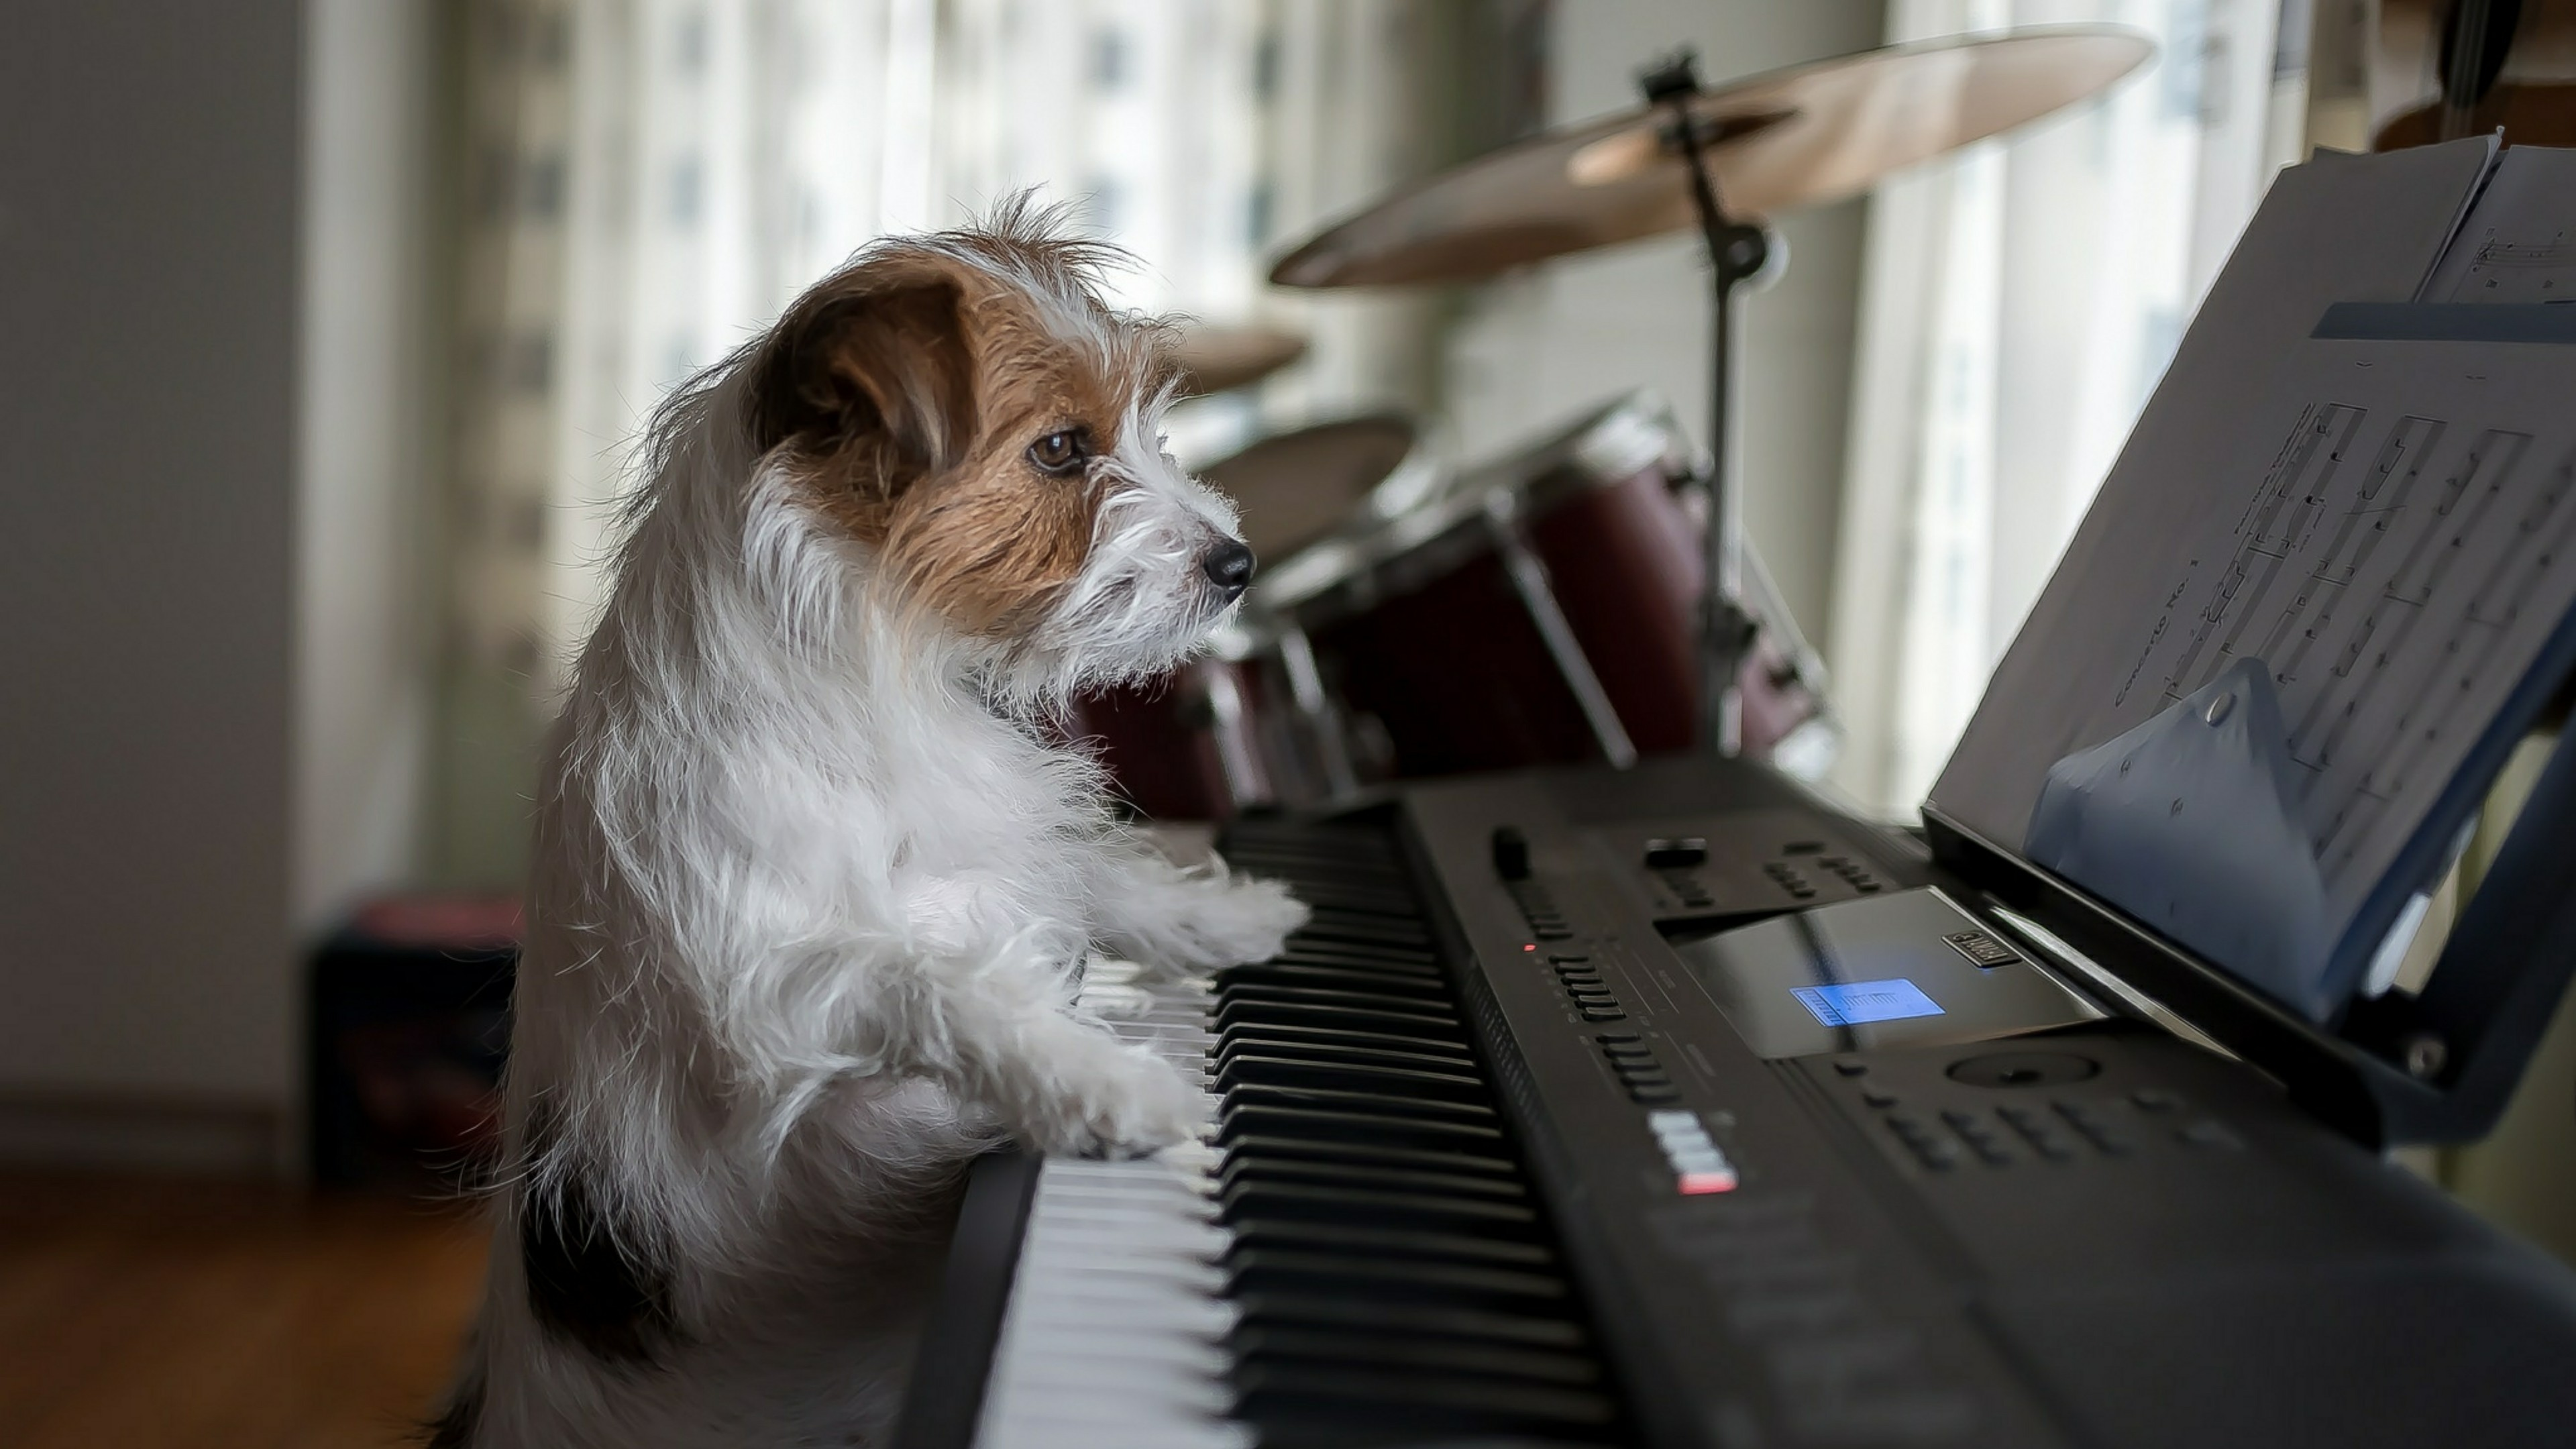 Pianist Jack Russell Terrier wallpaper